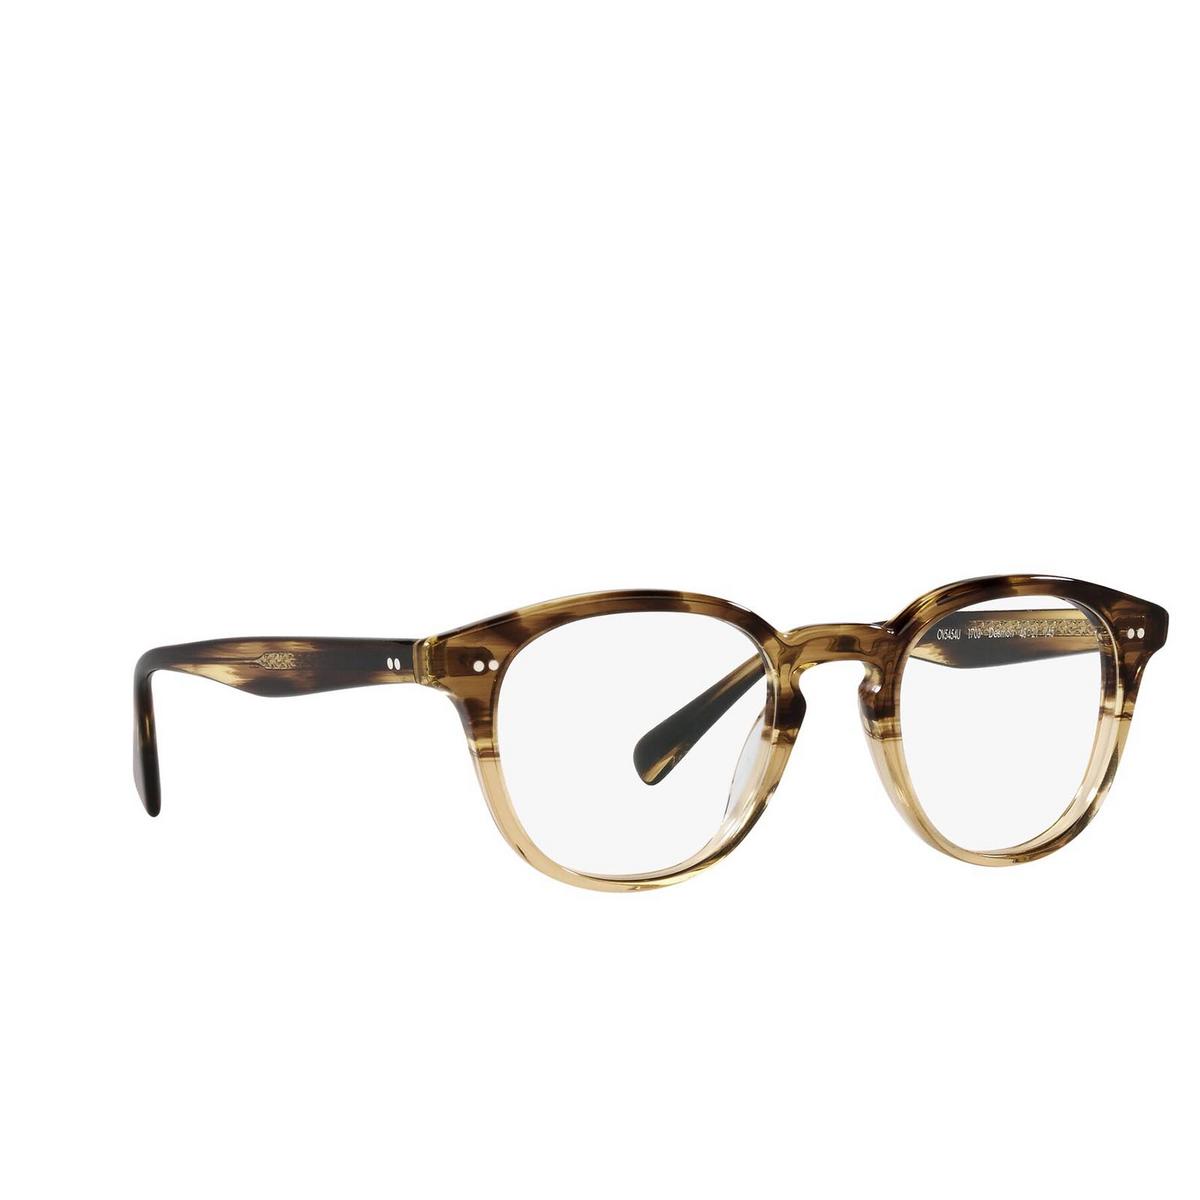 Oliver Peoples® Square Eyeglasses: Desmon OV5454U color Canarywood Gradient 1703 - three-quarters view.